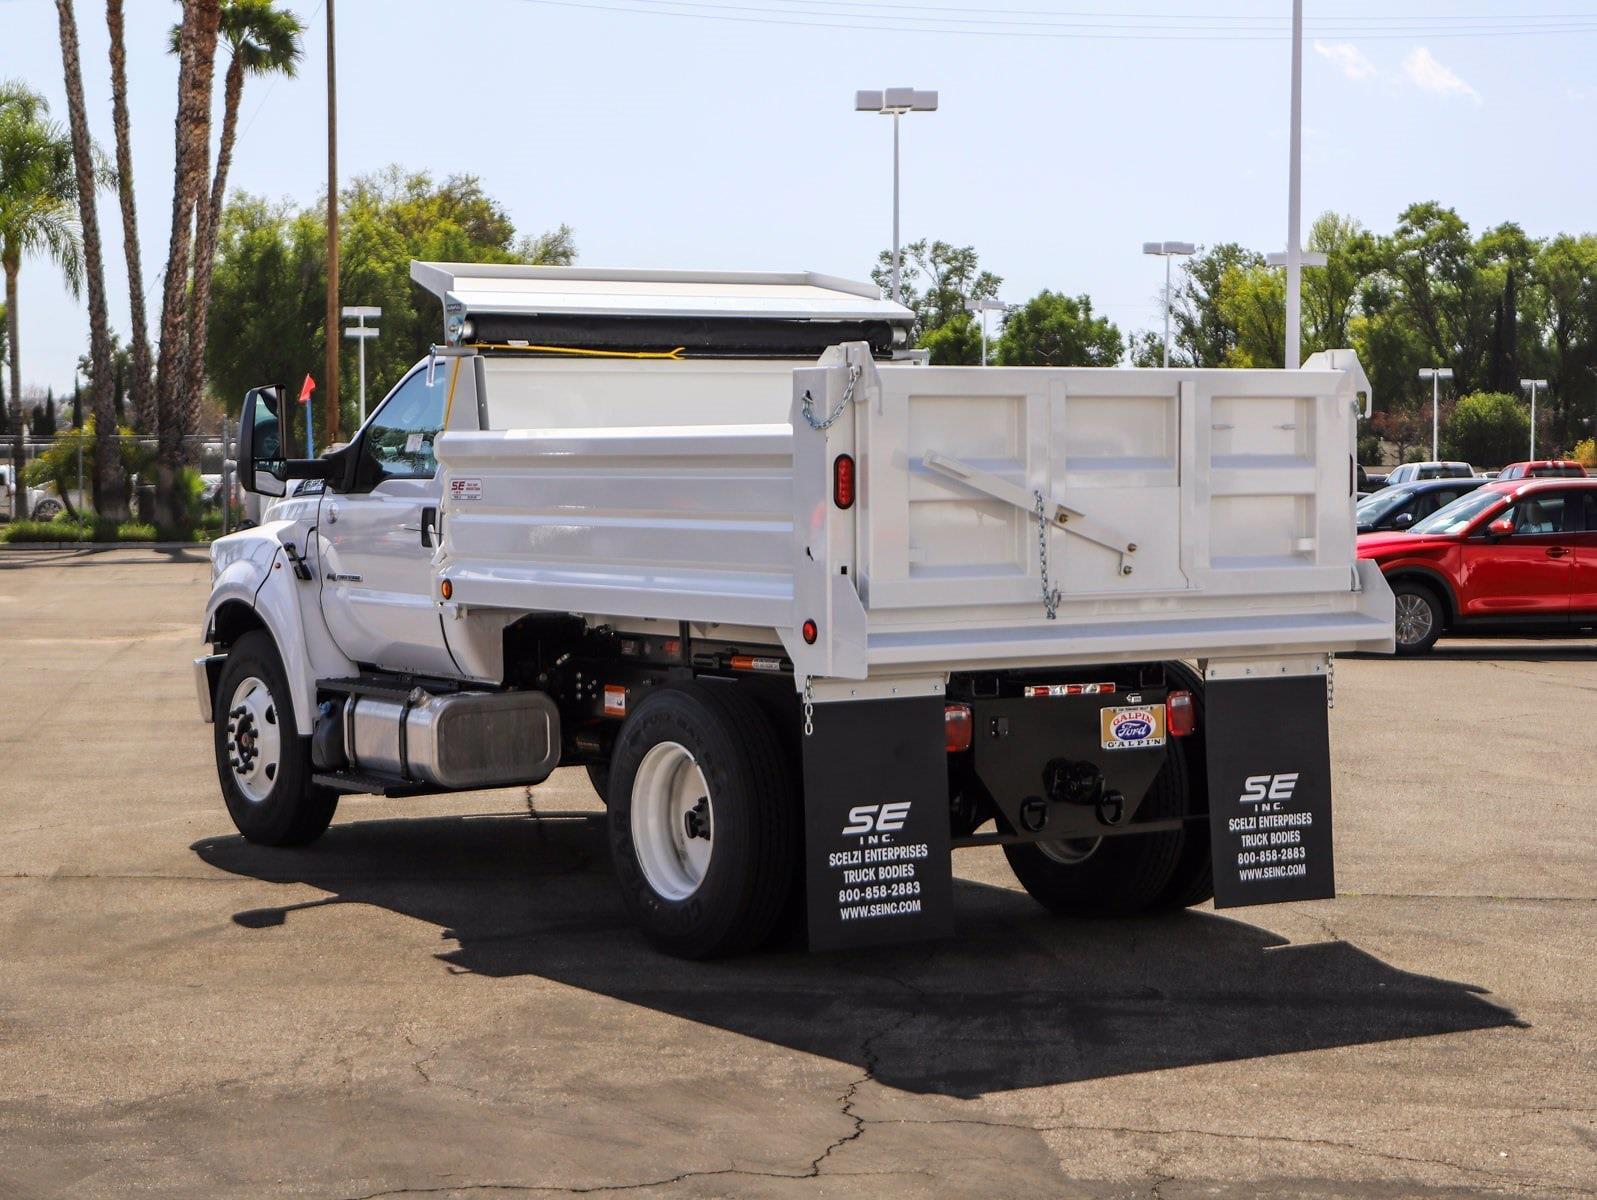 2021 Ford F-650 Regular Cab DRW 4x2, Scelzi Dump Body #E211037 - photo 1